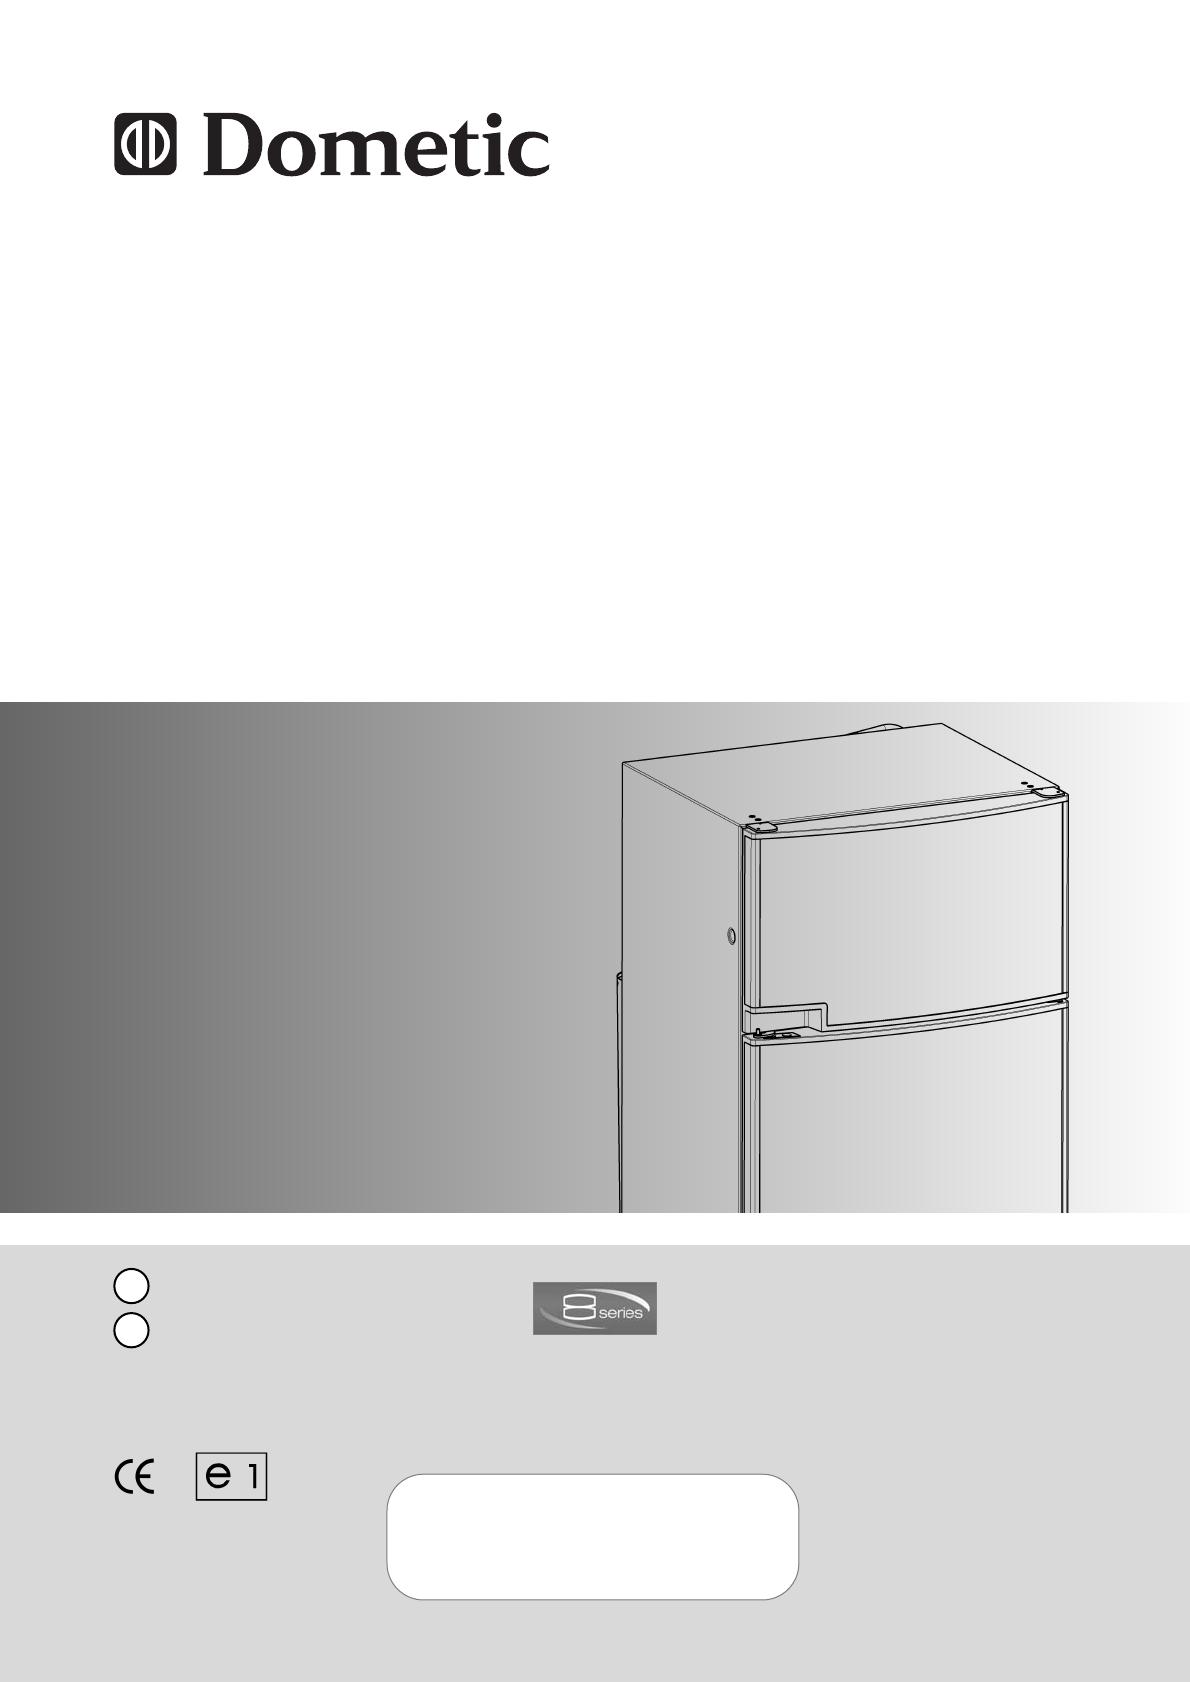 Bedienungsanleitung dometic rm 8505